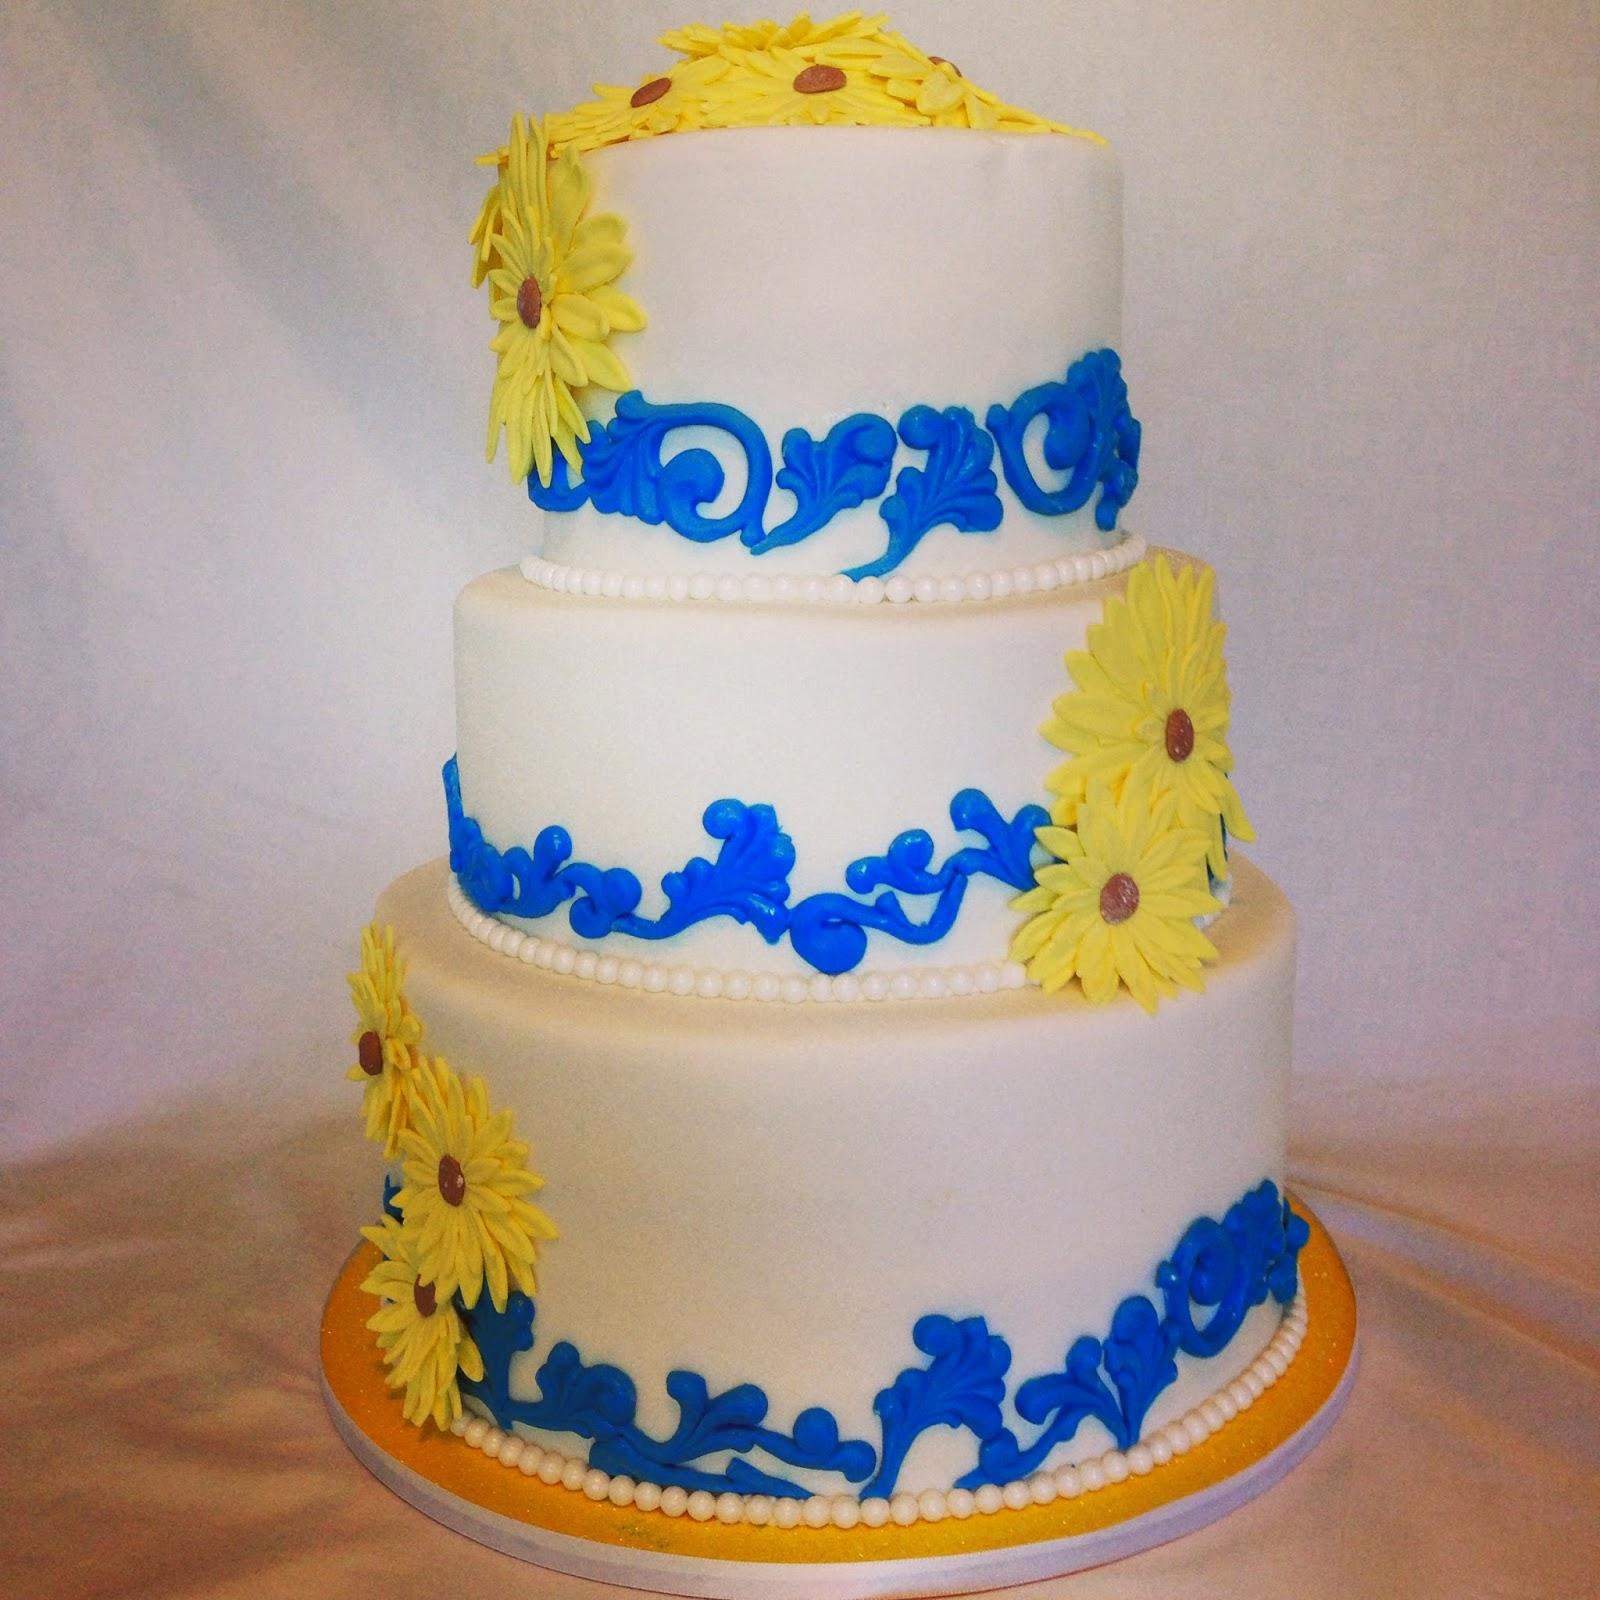 Simply Delicious Cakes Roseburg Oregon